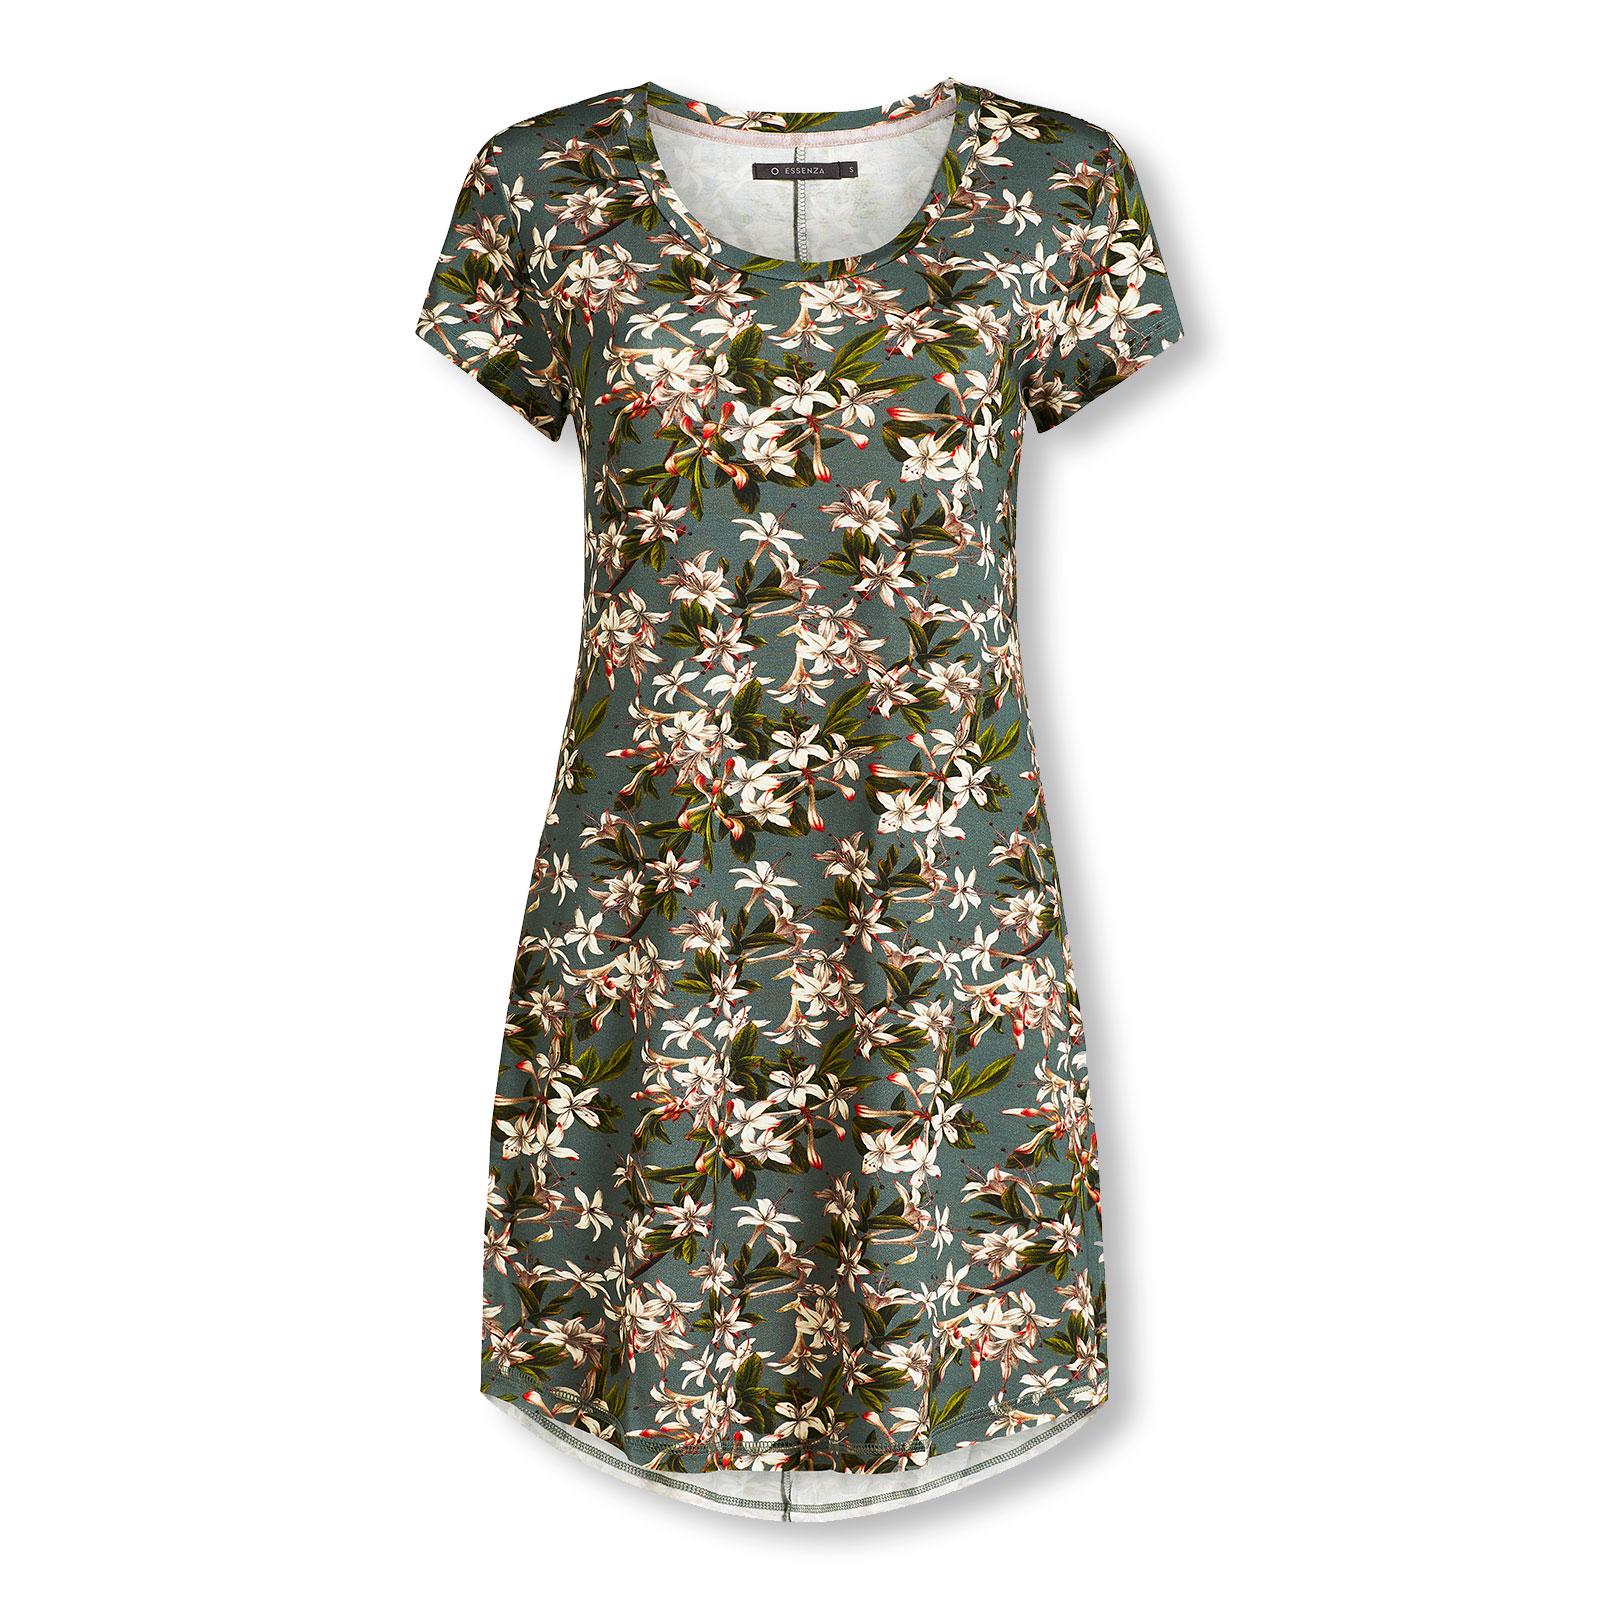 ESSENZA Damen Nachthemd Sleepshirt kurzarm Isa Verano Nightdress Short Sleeve 401265-326 in dusty rose